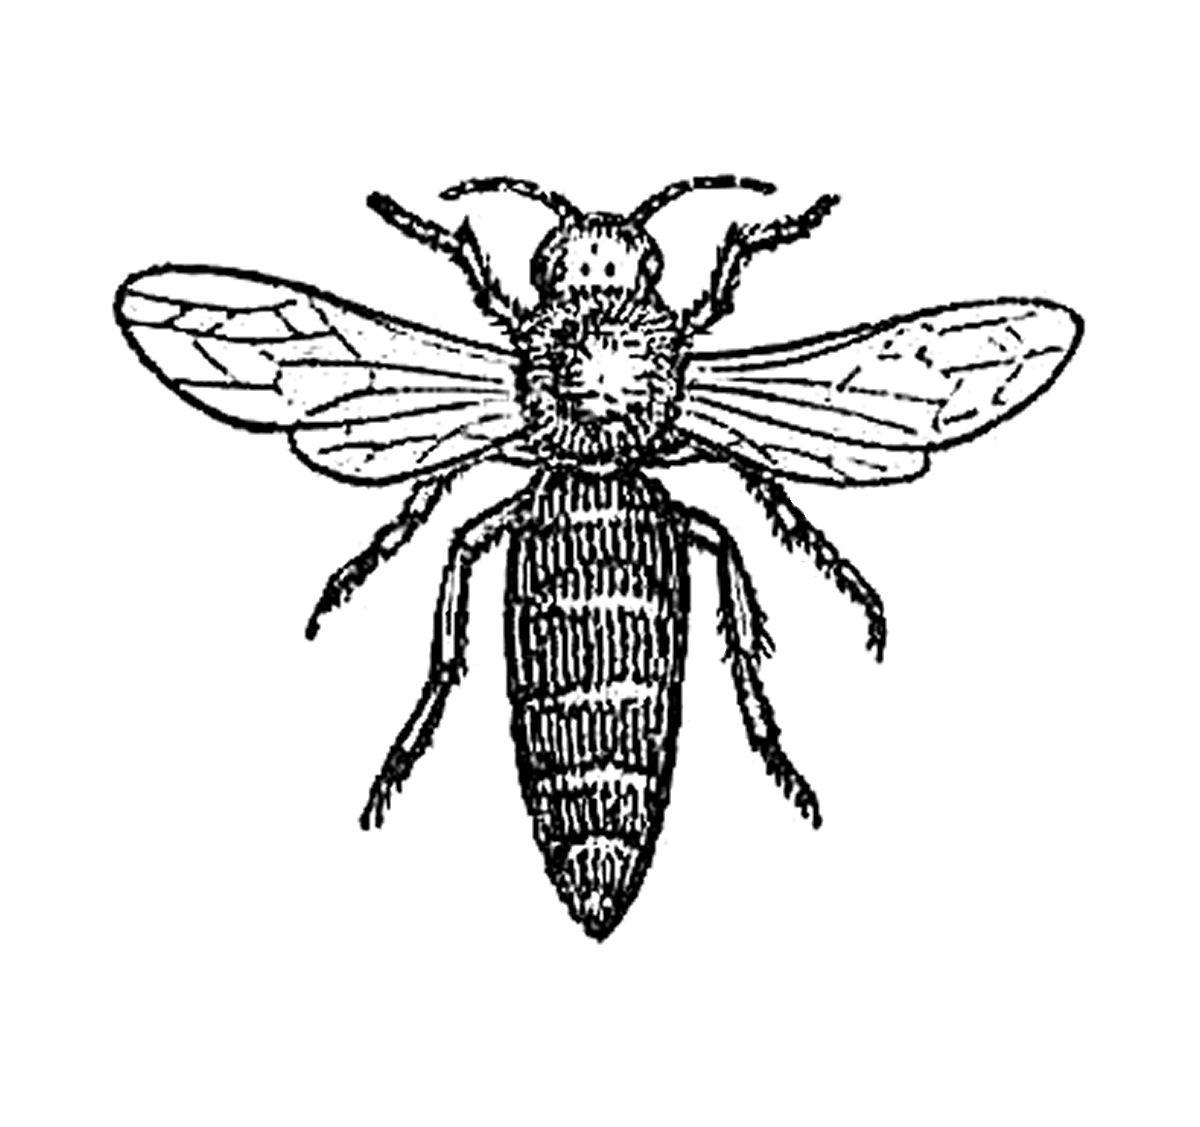 Antique Images Free Animal Graphic Image Transfer Design